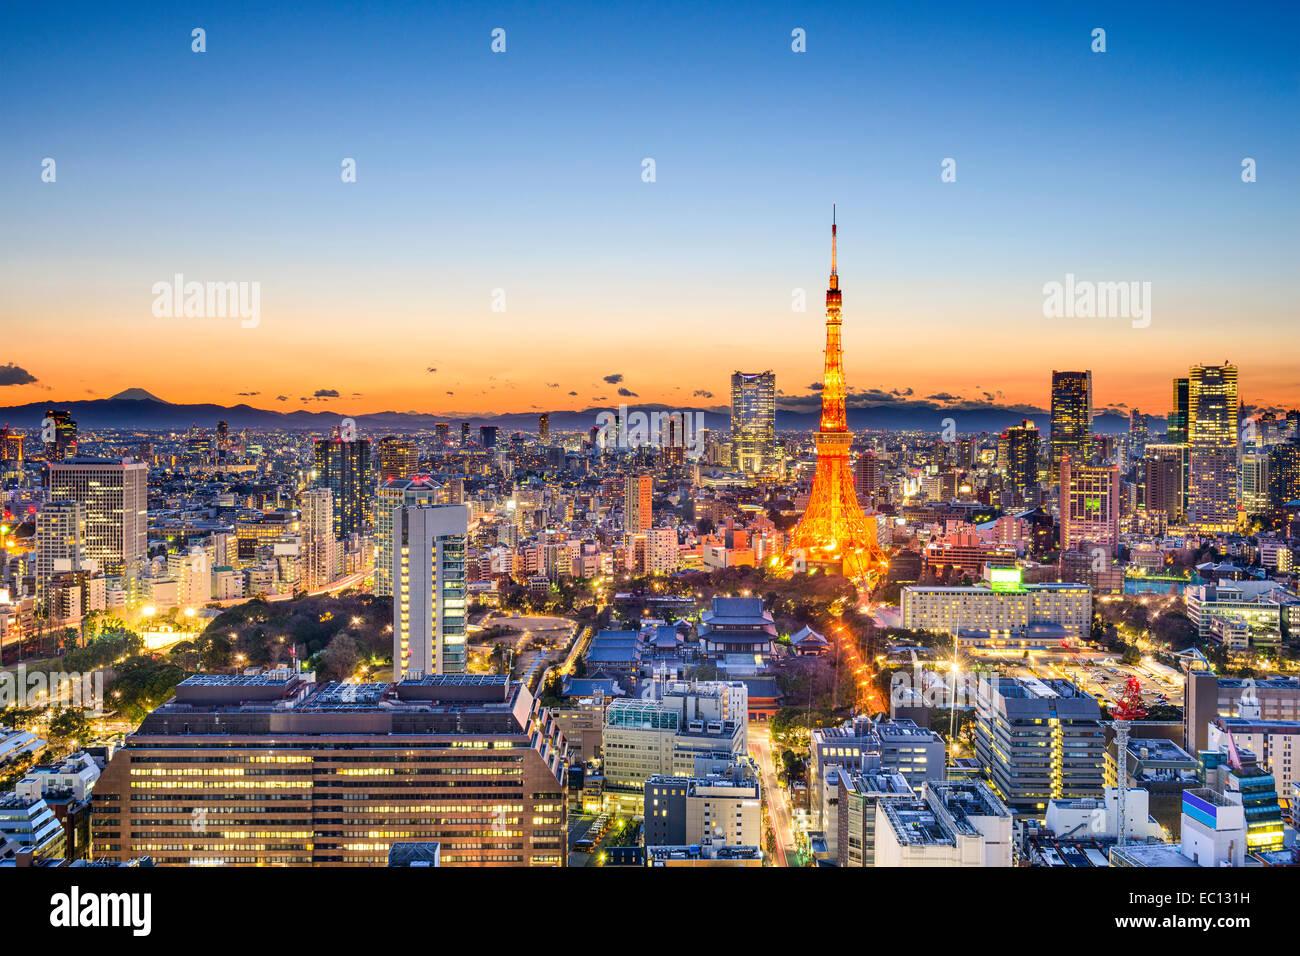 Tokyo, Japan skyline at Tokyo Tower. - Stock Image